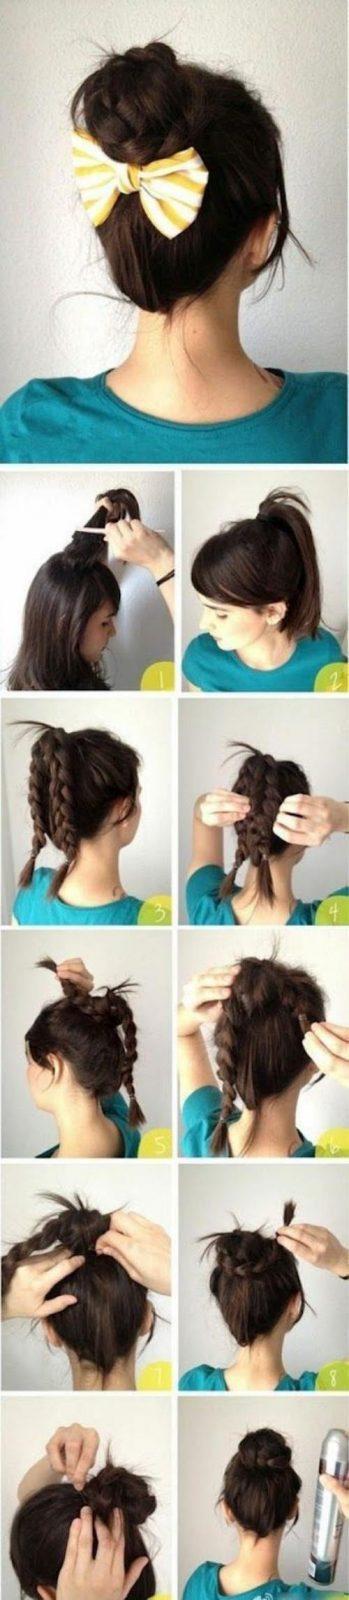 hair-styles-19